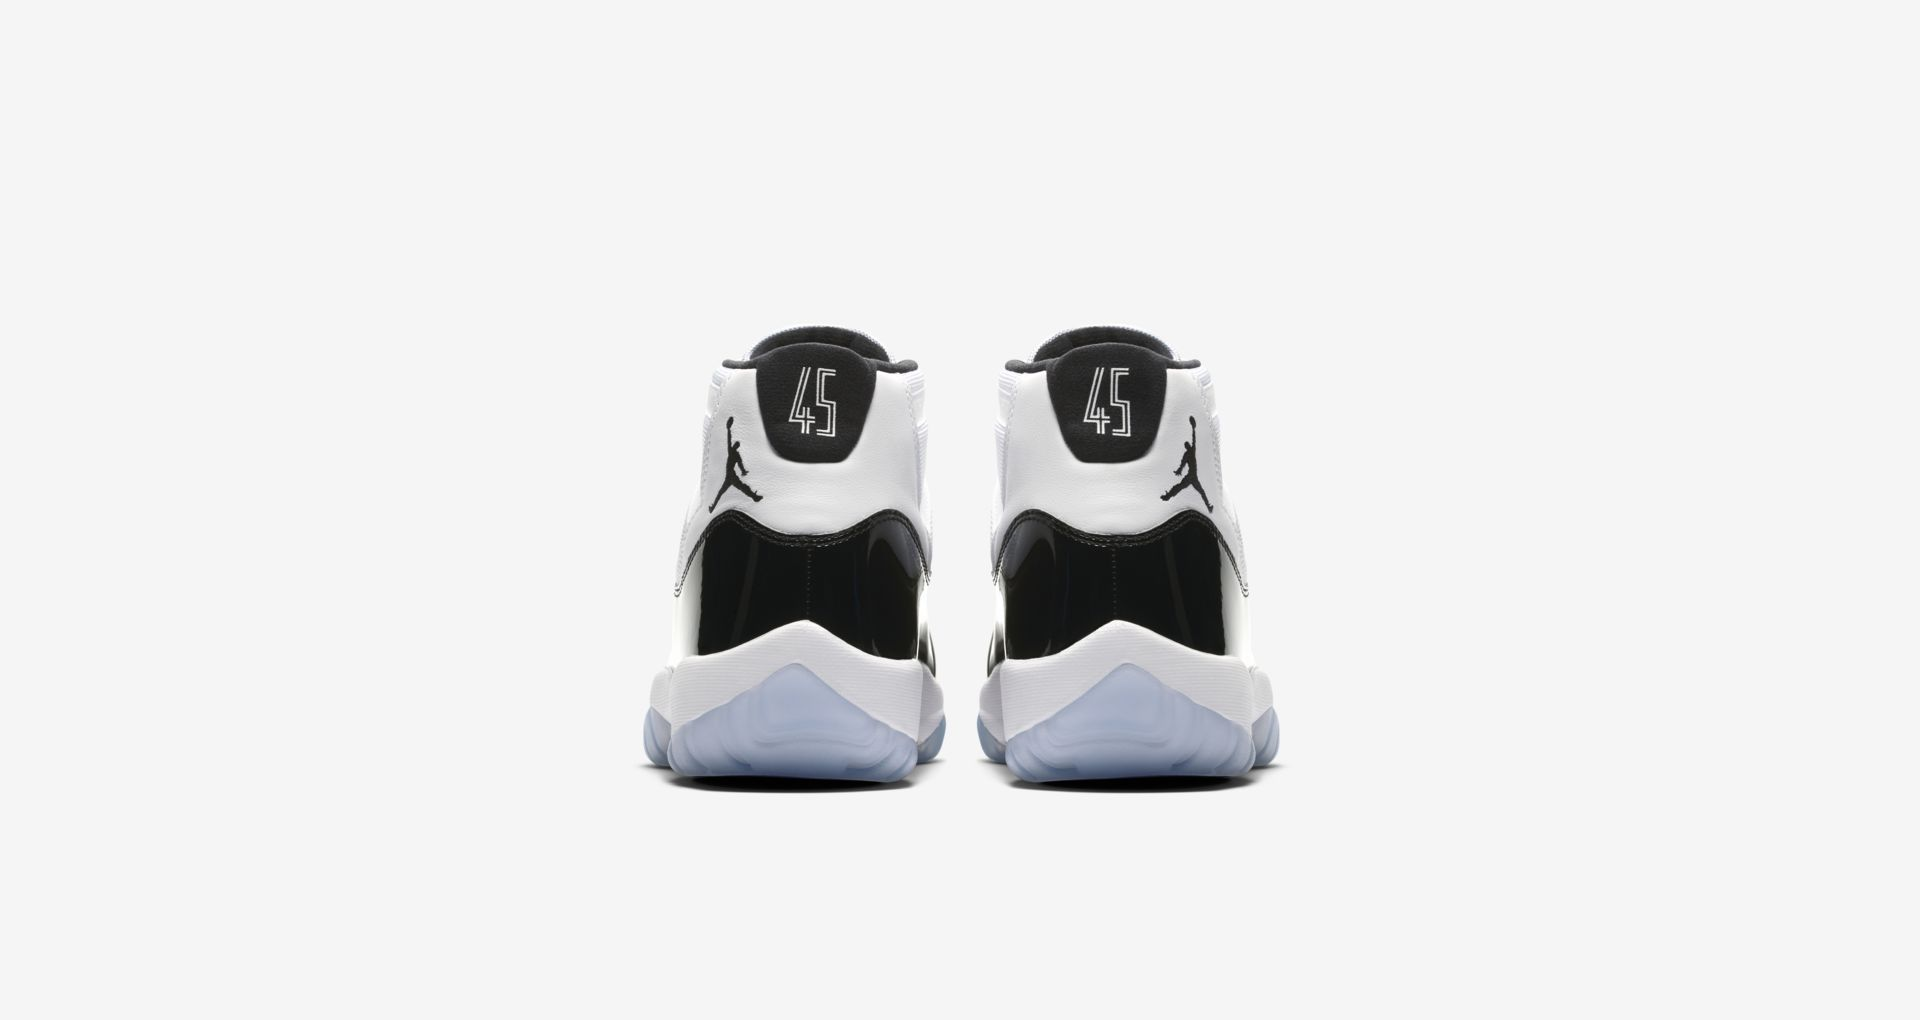 378037 100 Air Jordan 11 Retro Concord 5